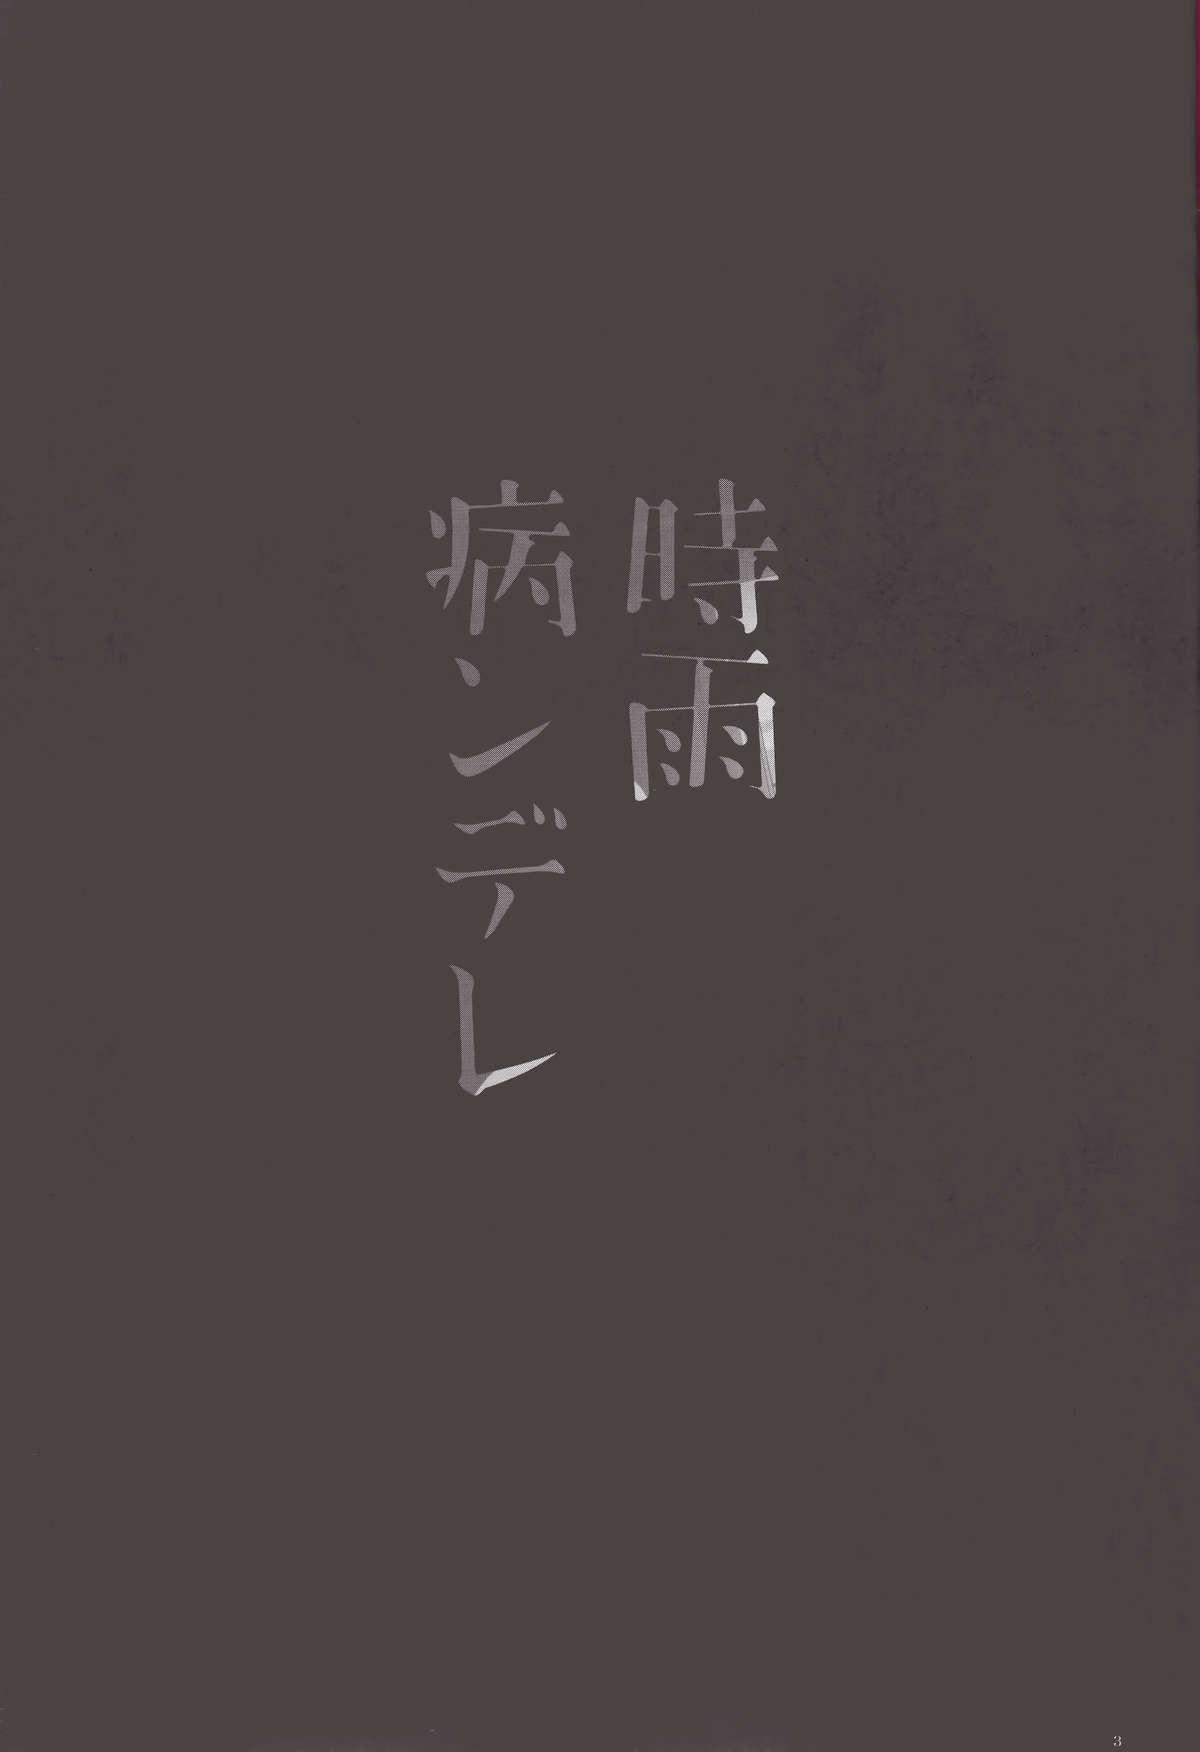 Shigure Yandere 3